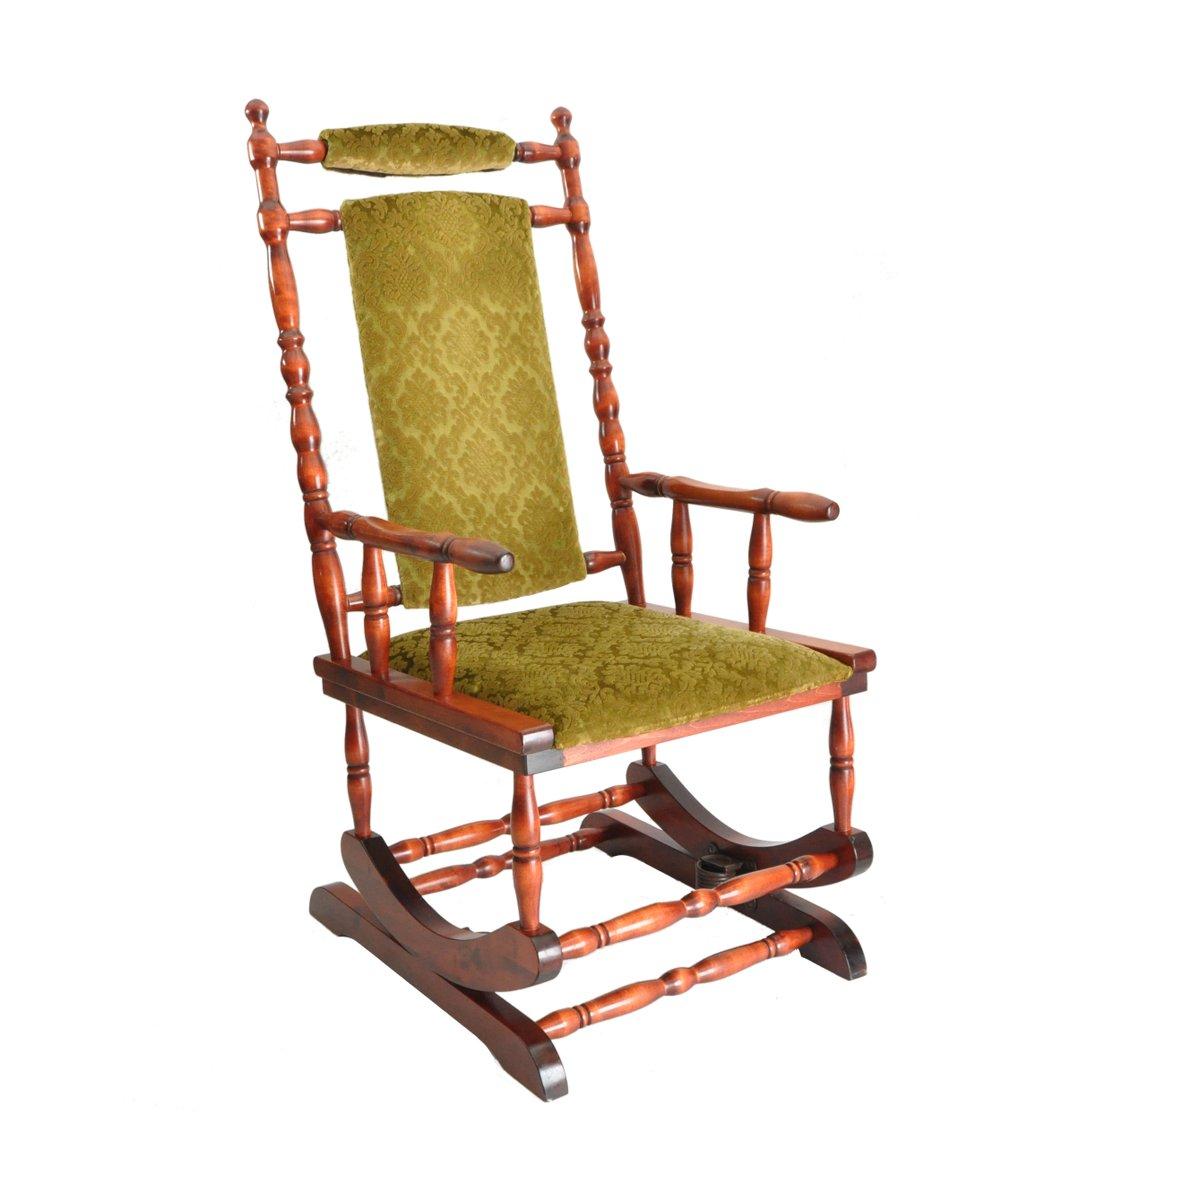 skandinavischer holz schaukelstuhl 1950er bei pamono kaufen. Black Bedroom Furniture Sets. Home Design Ideas